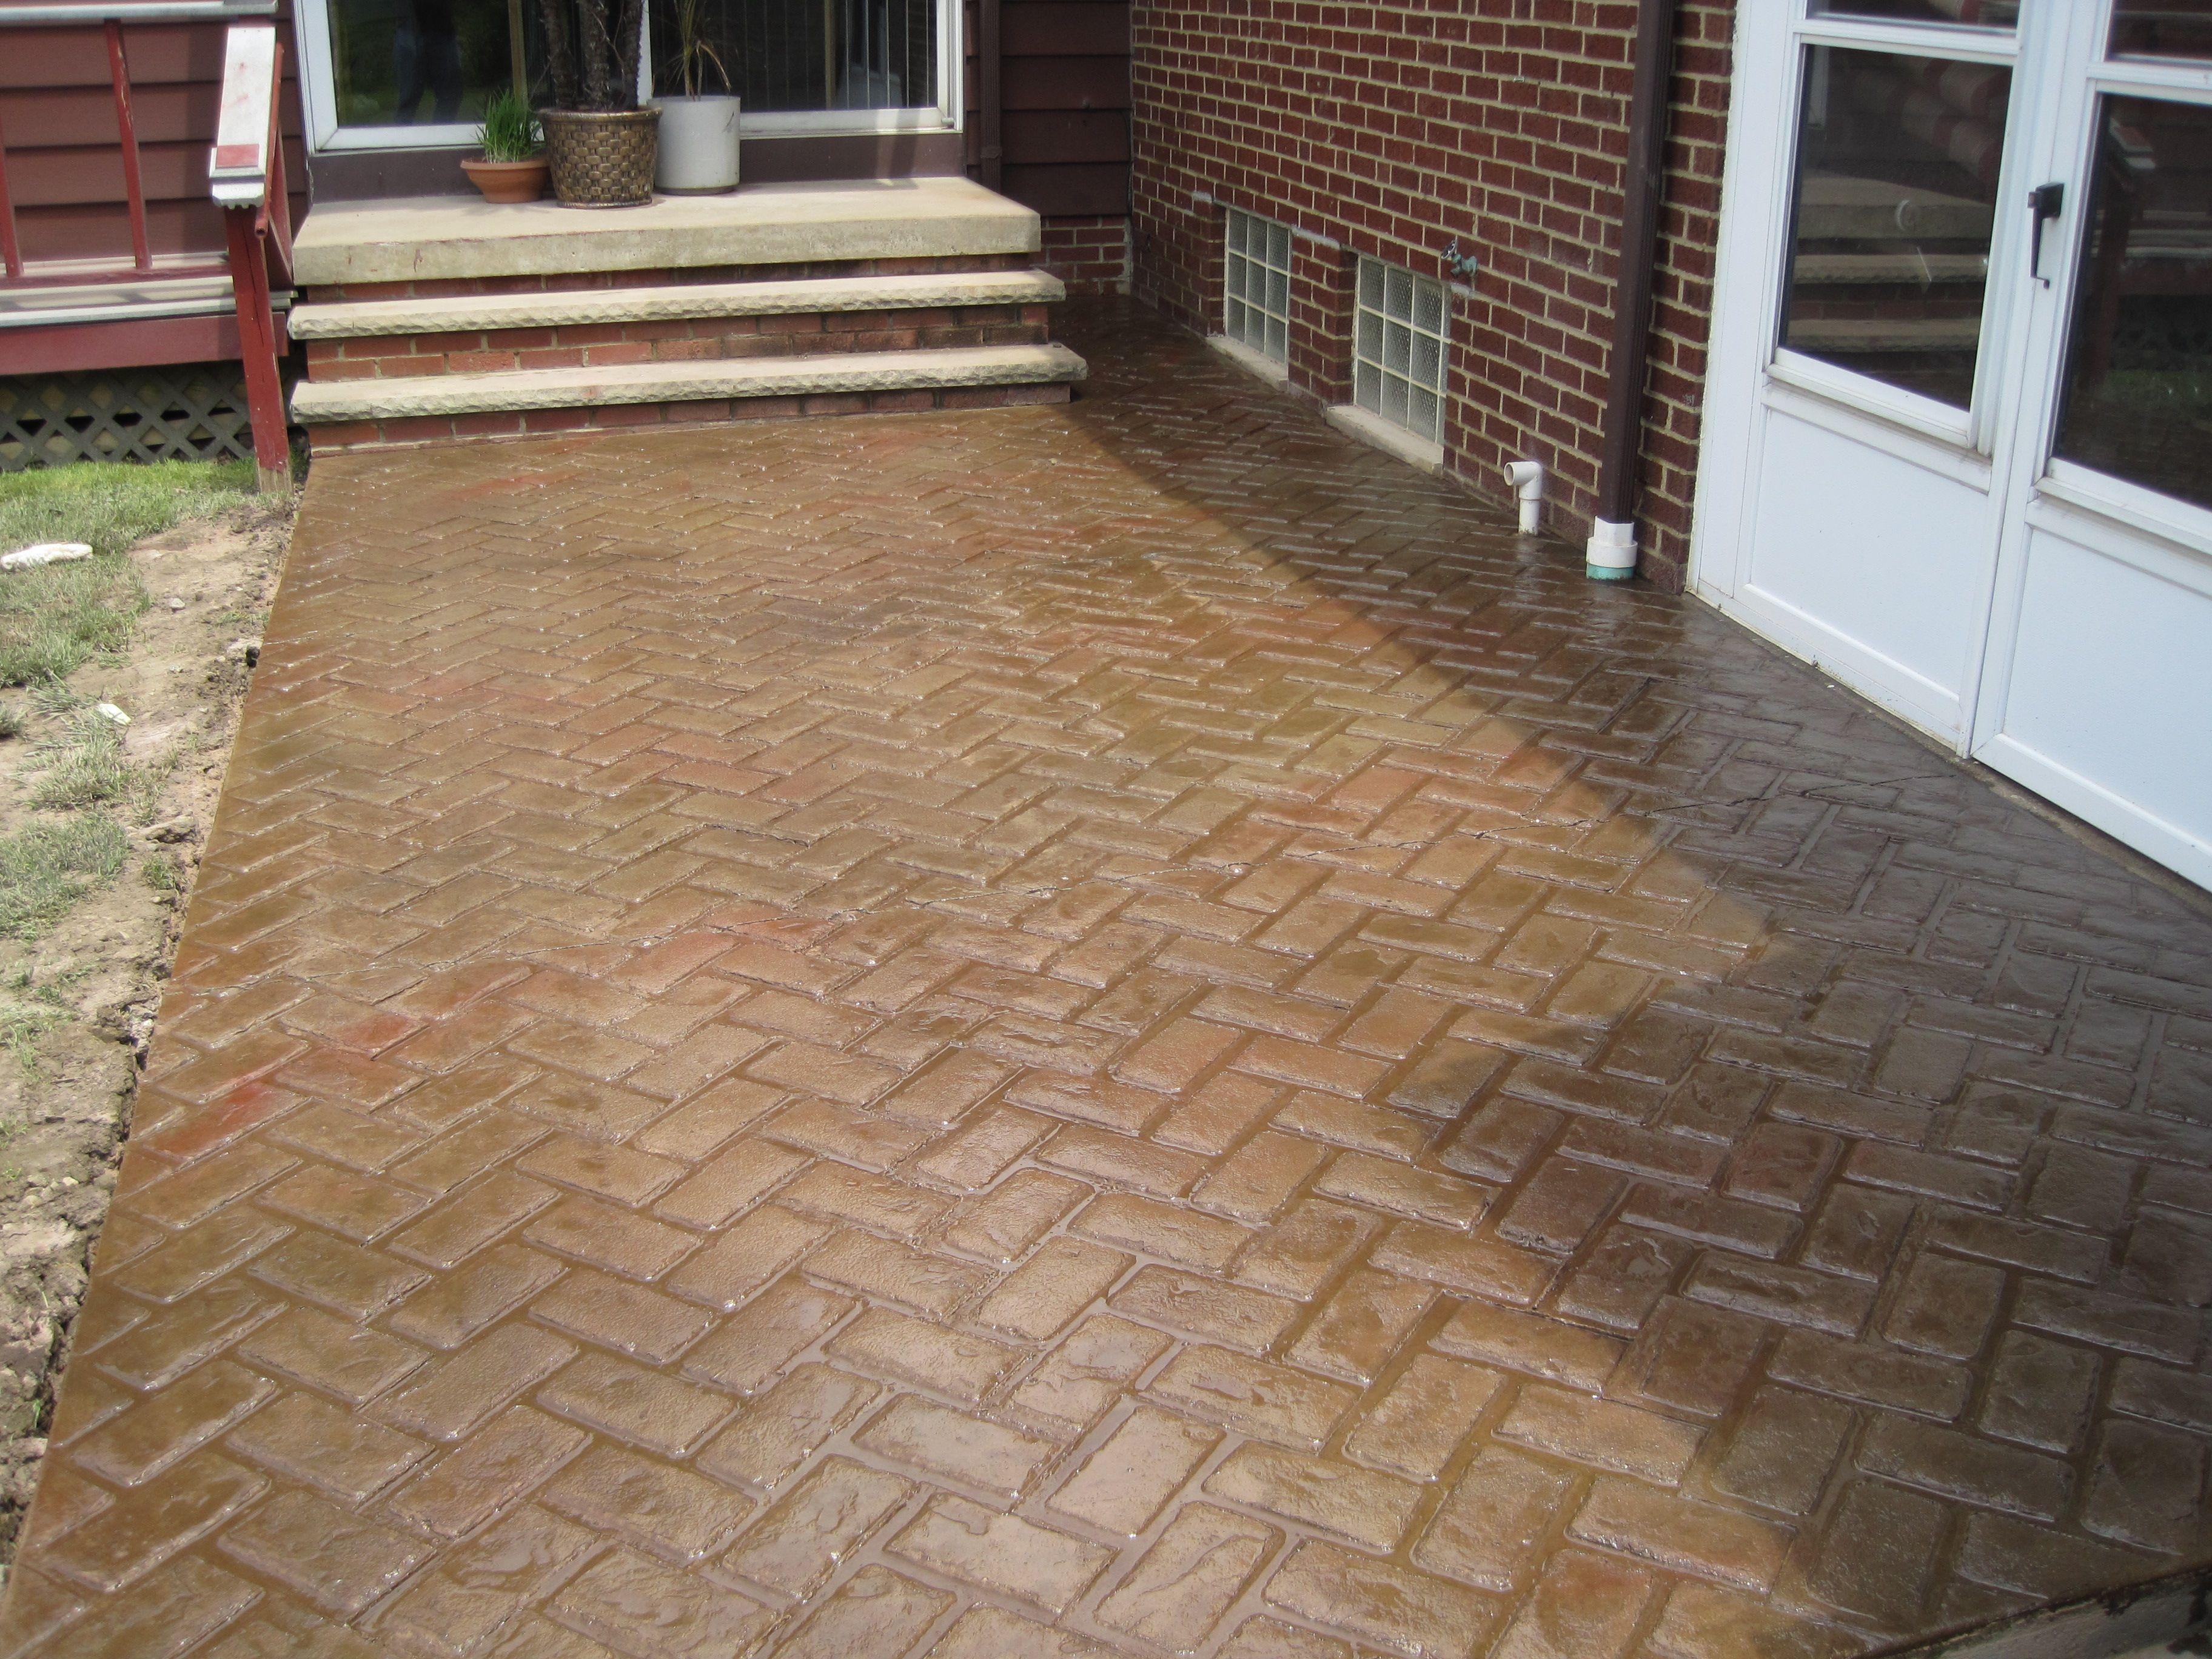 Patio in New Brick Herringbone pattern  Stamped Concrete